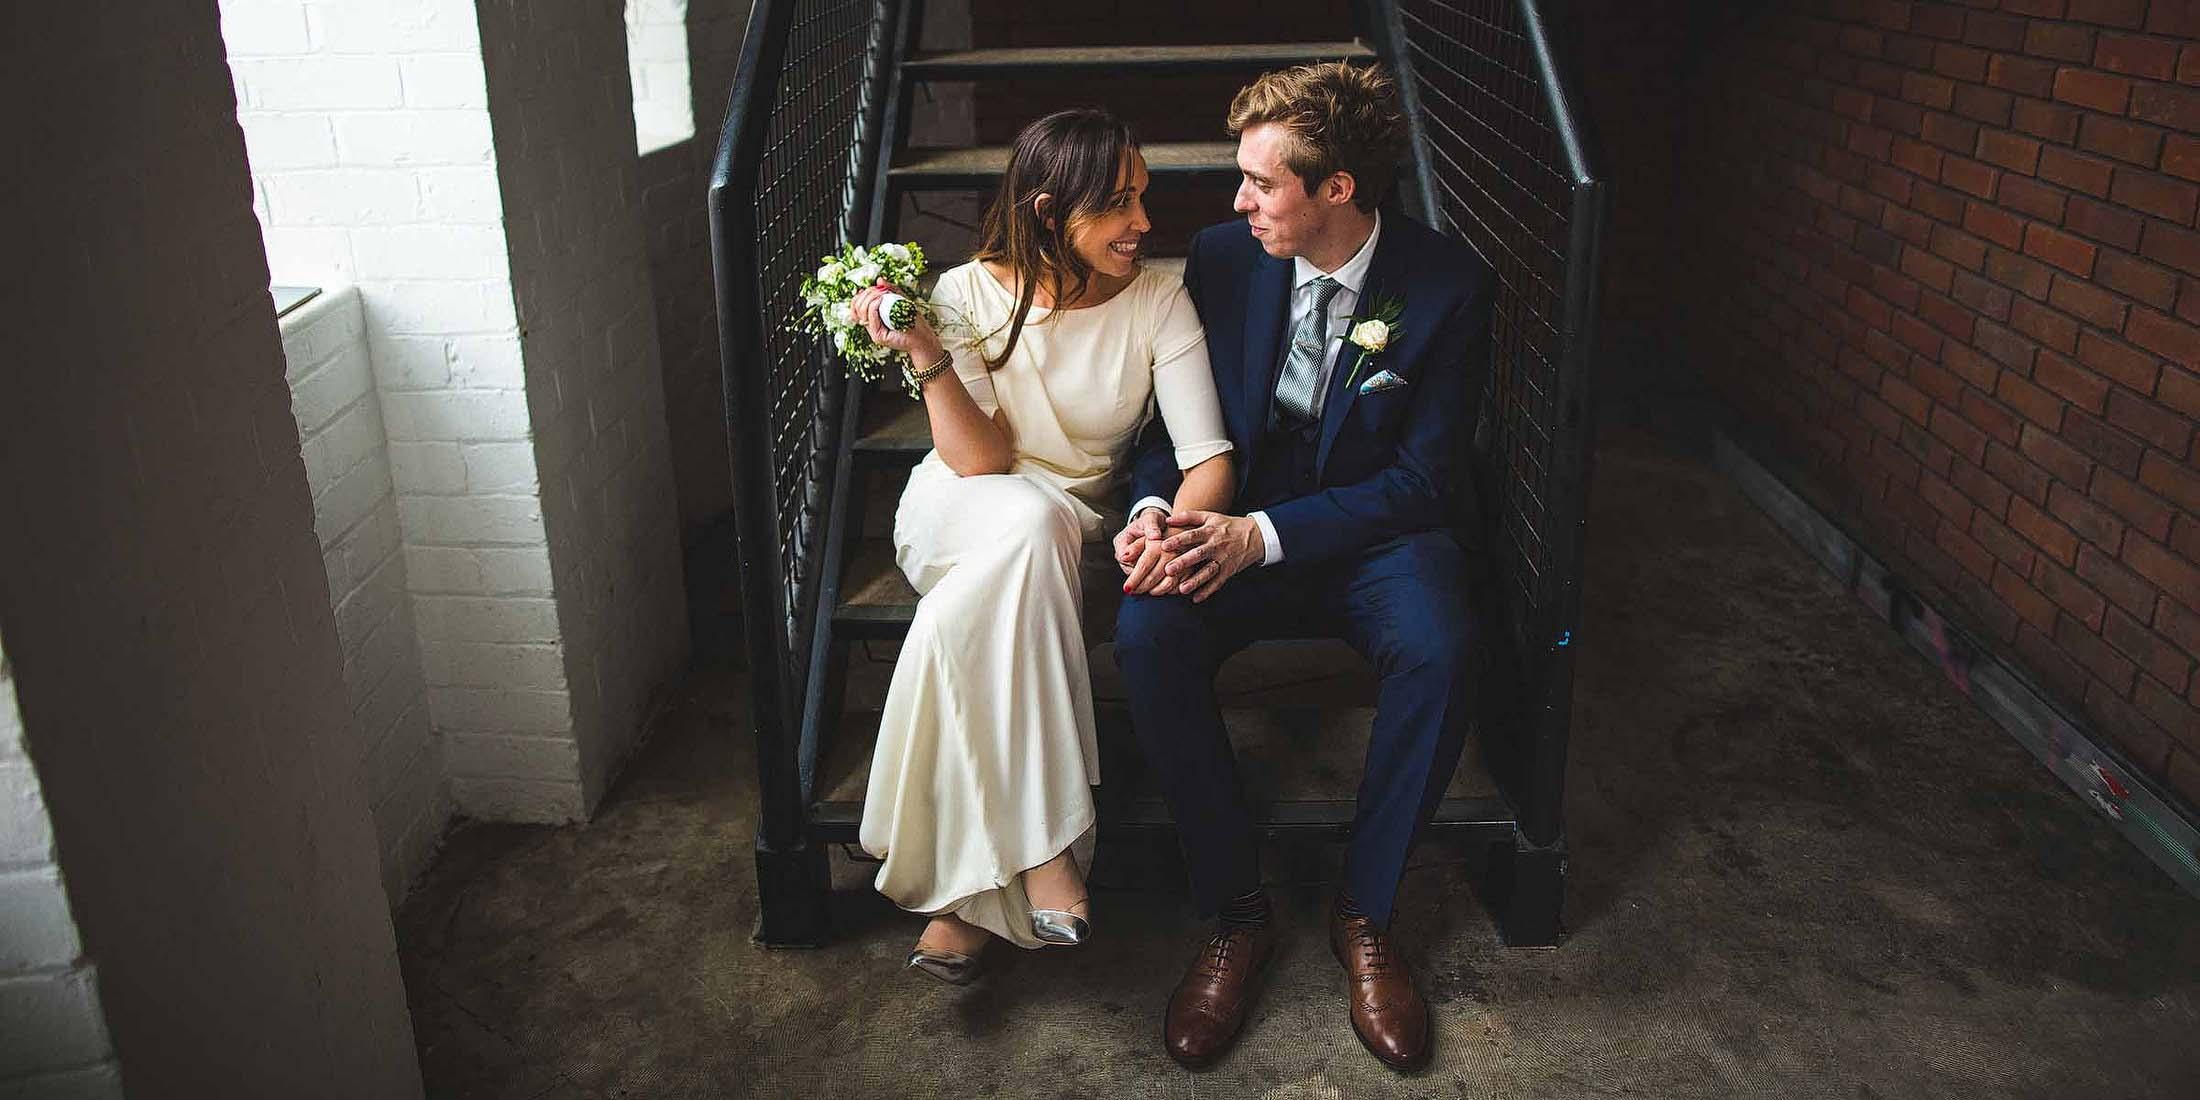 Love my dress wedding1